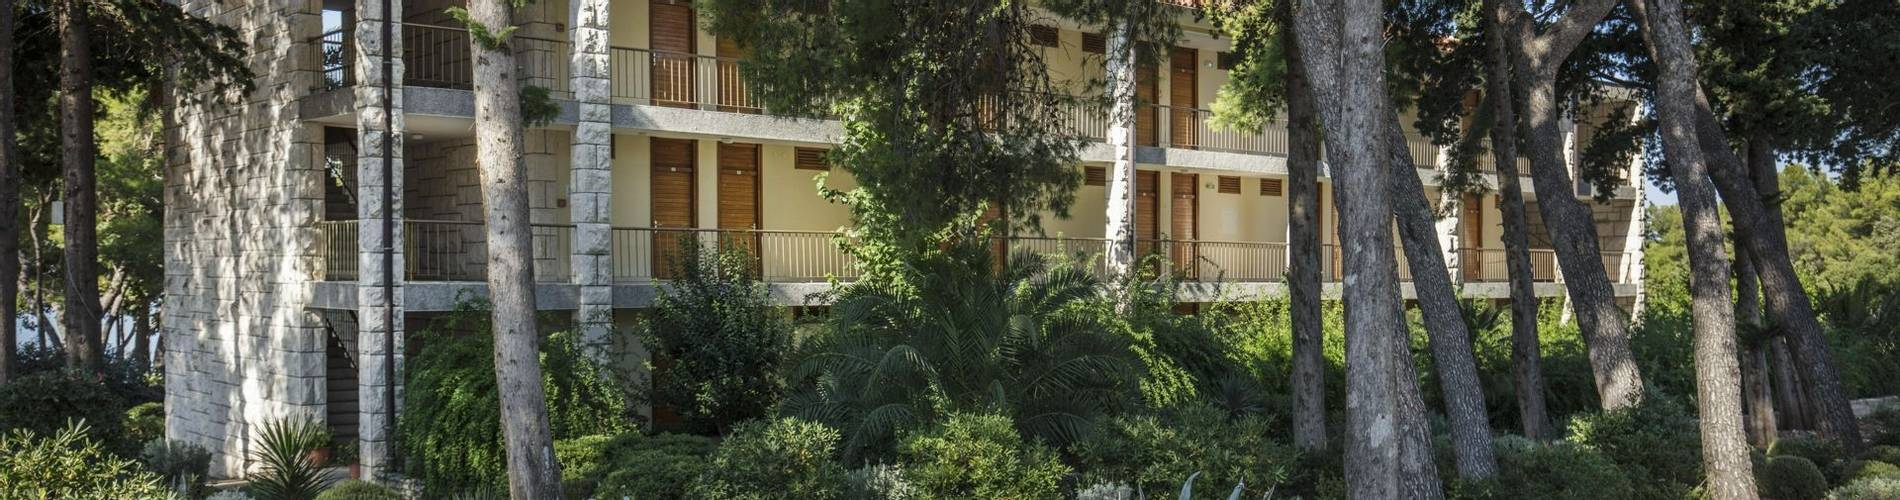 03 Resort_Velaris - Pavilions_Vlacica (3) (1).jpg